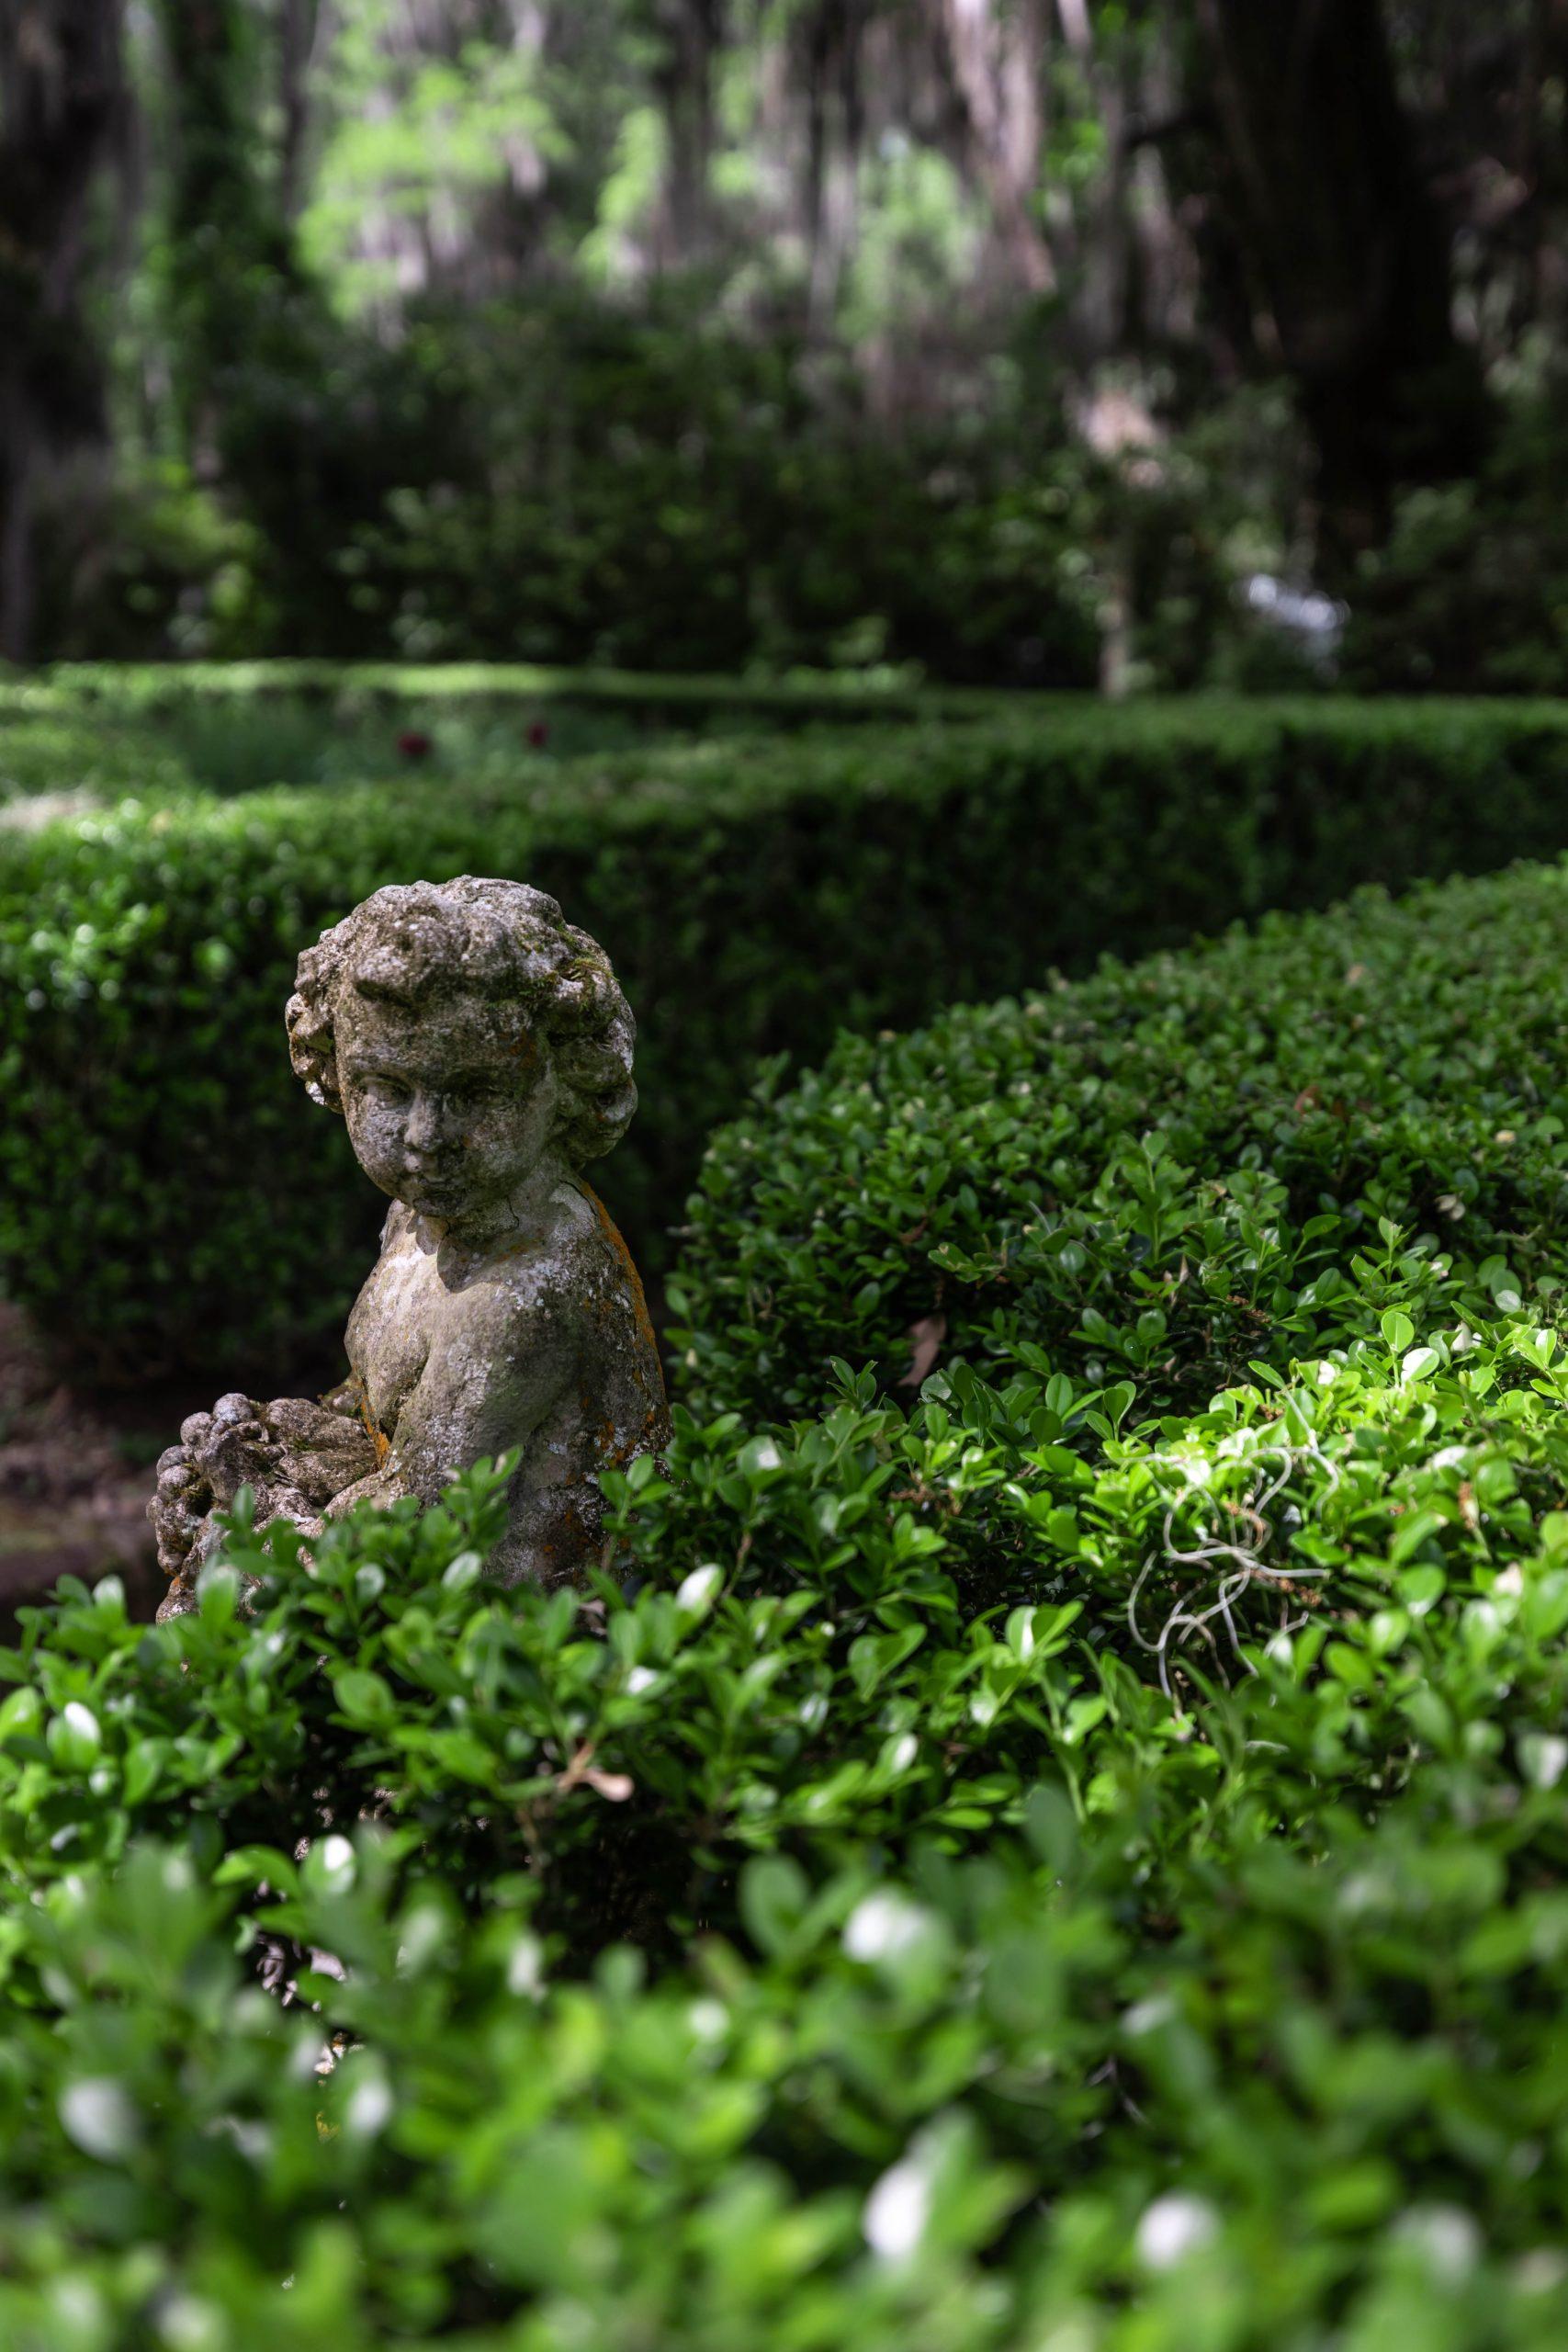 Boxwood Hedge Maze and Cherub Statue at Magnolia Plantation & Gardens Written & Photographed by Annie Fairfax